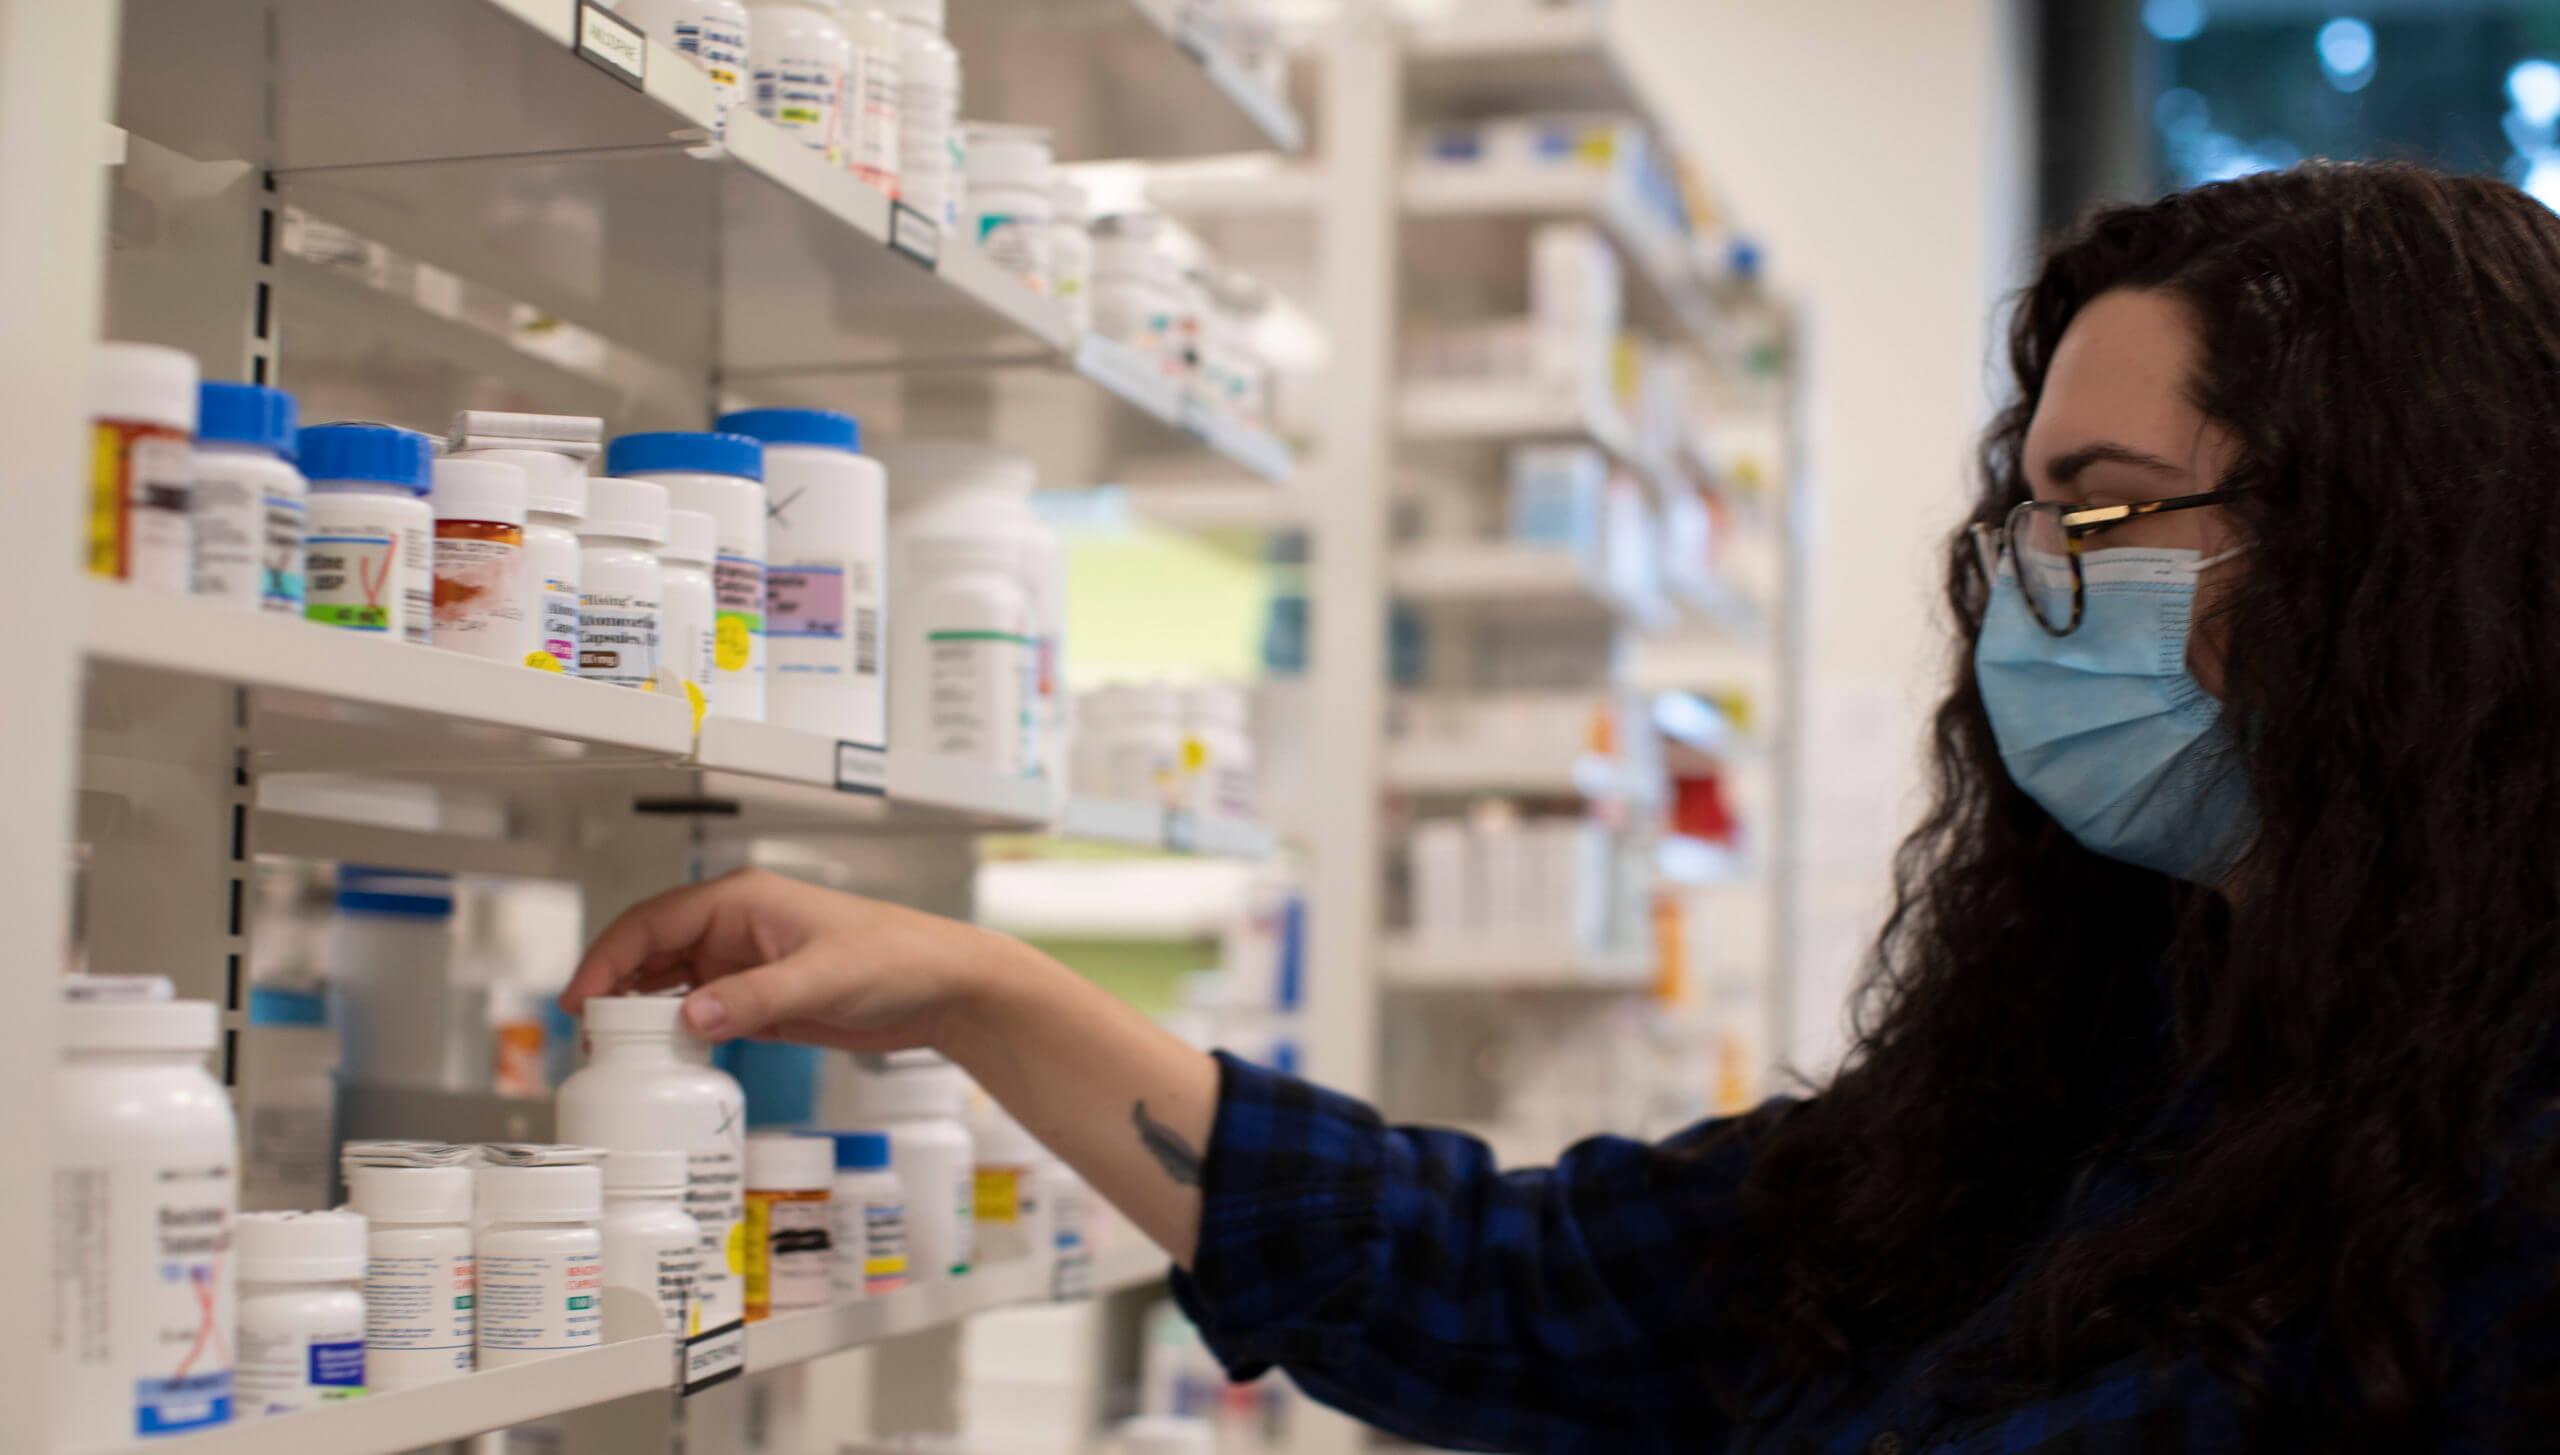 Pharmacy working grabbing a pill bottle